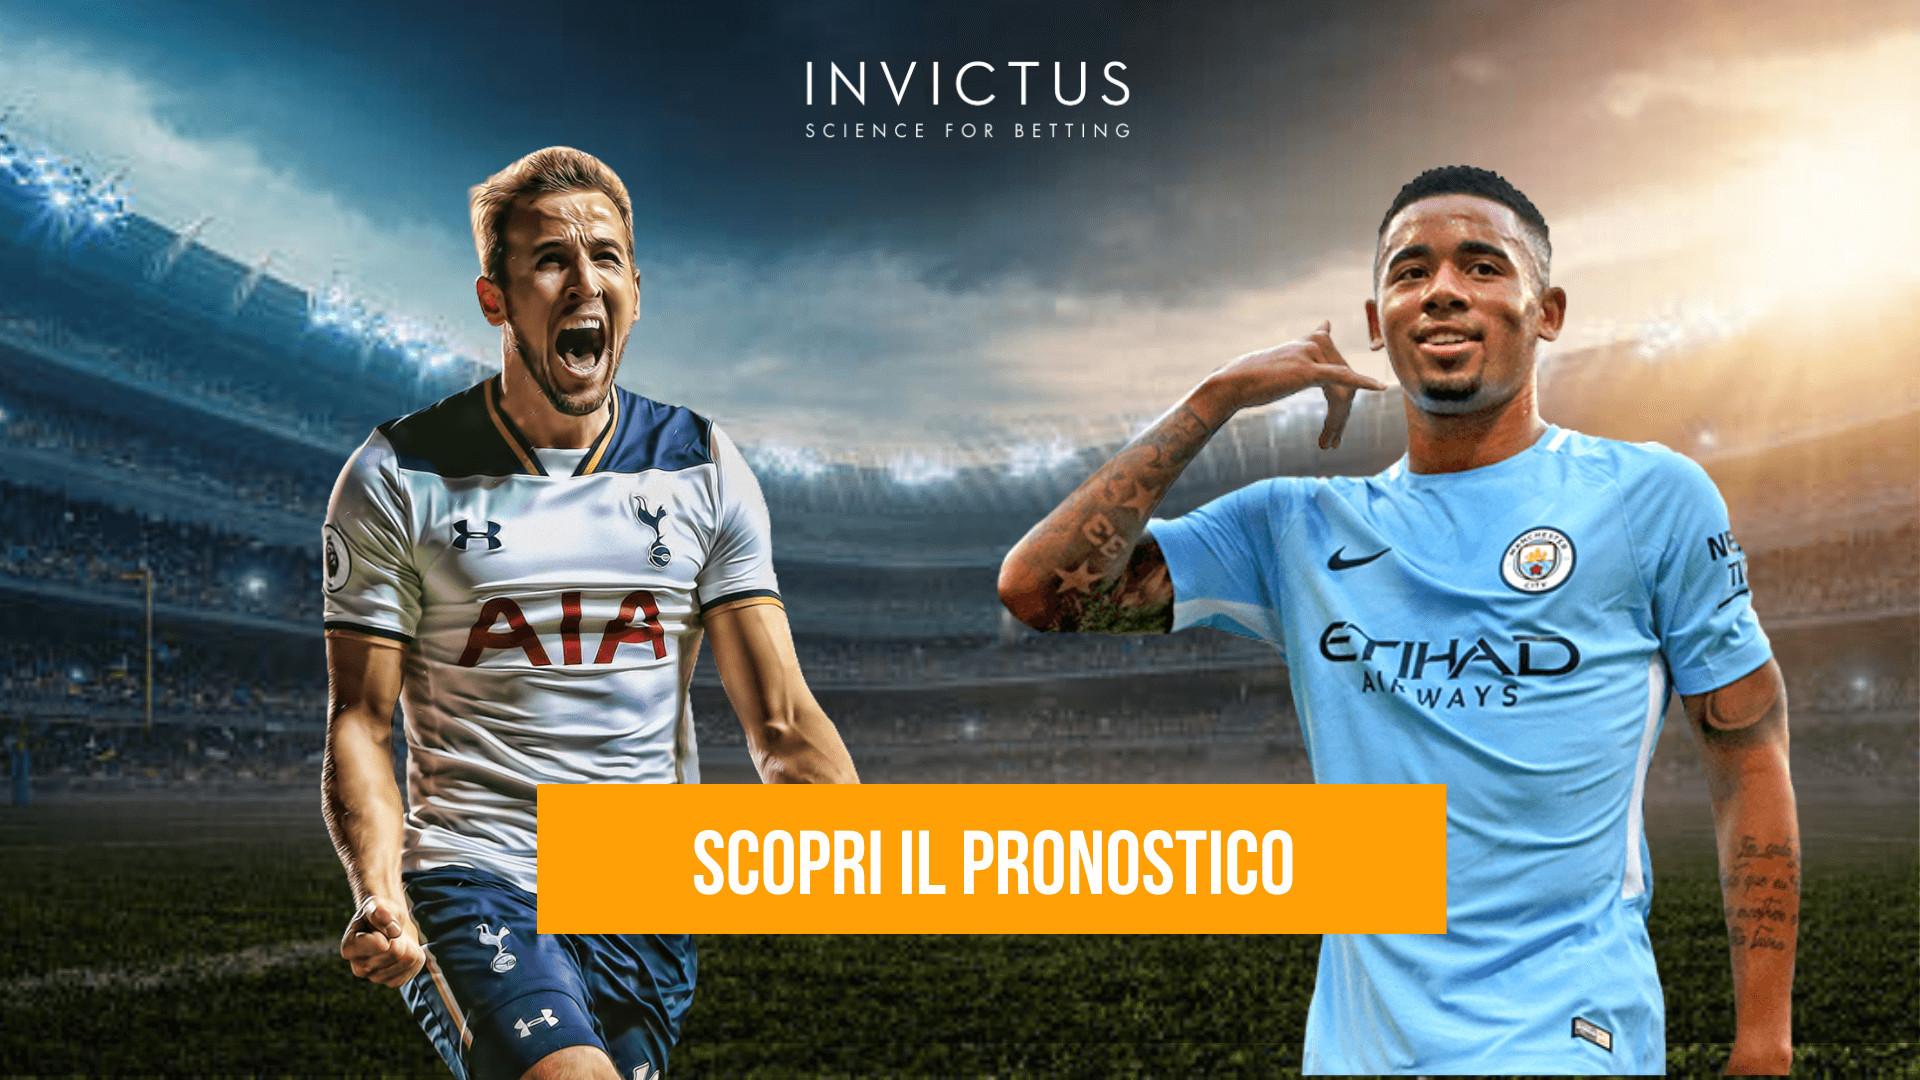 Pronostico Tottenham - Manchester City - Invictus Blog